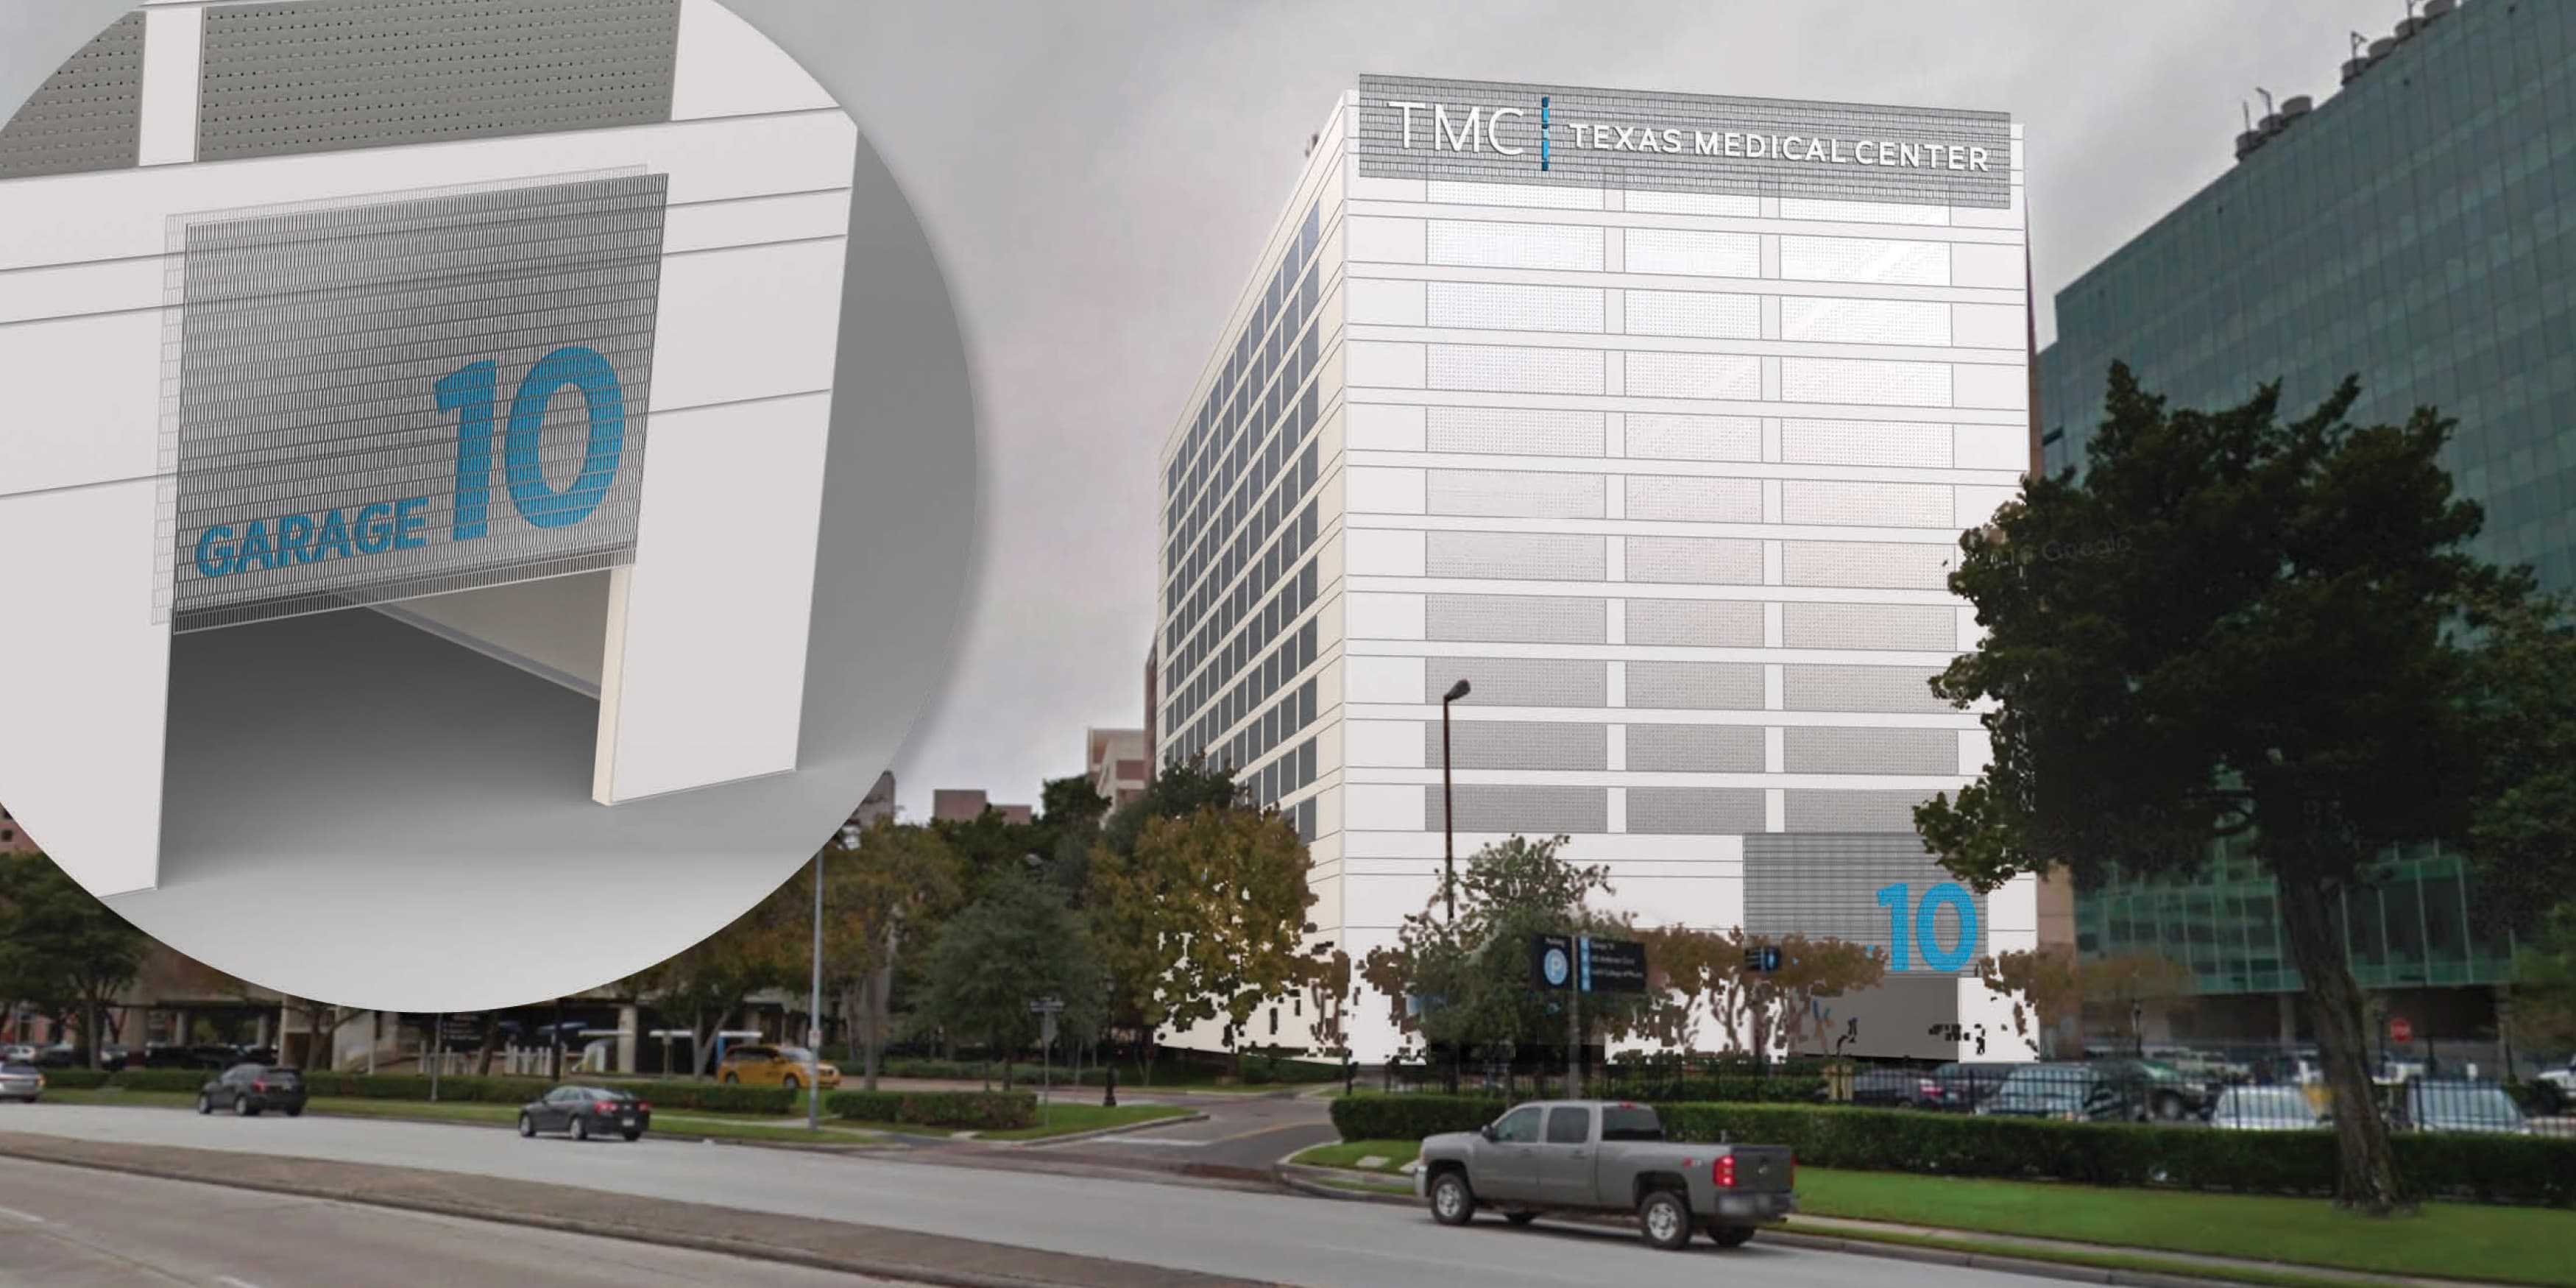 Texas Medical Center, located in Houston, Texas. Urban Design. Healthcare Design. Civic Design. Wayfinding Design.